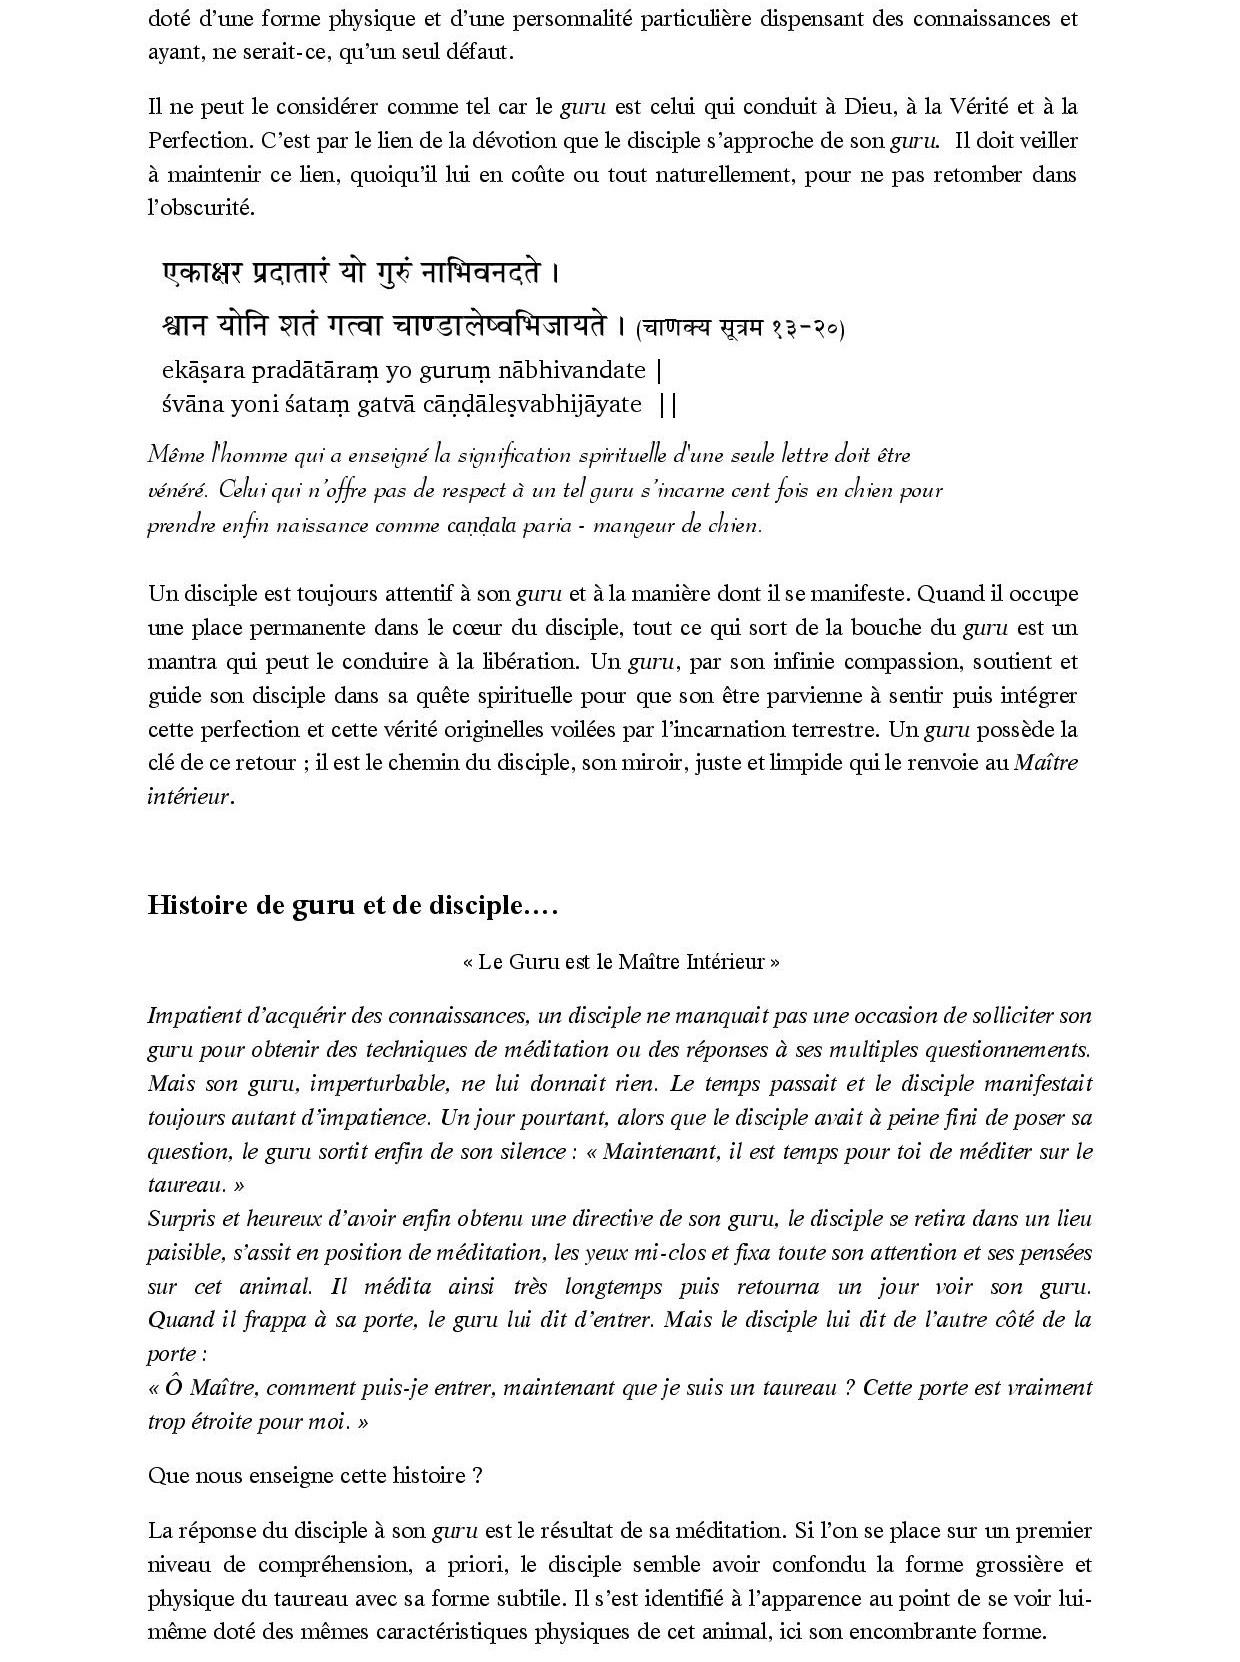 GURU PURNIMA ET HISTOIRE DU DISCIPLE-page-002